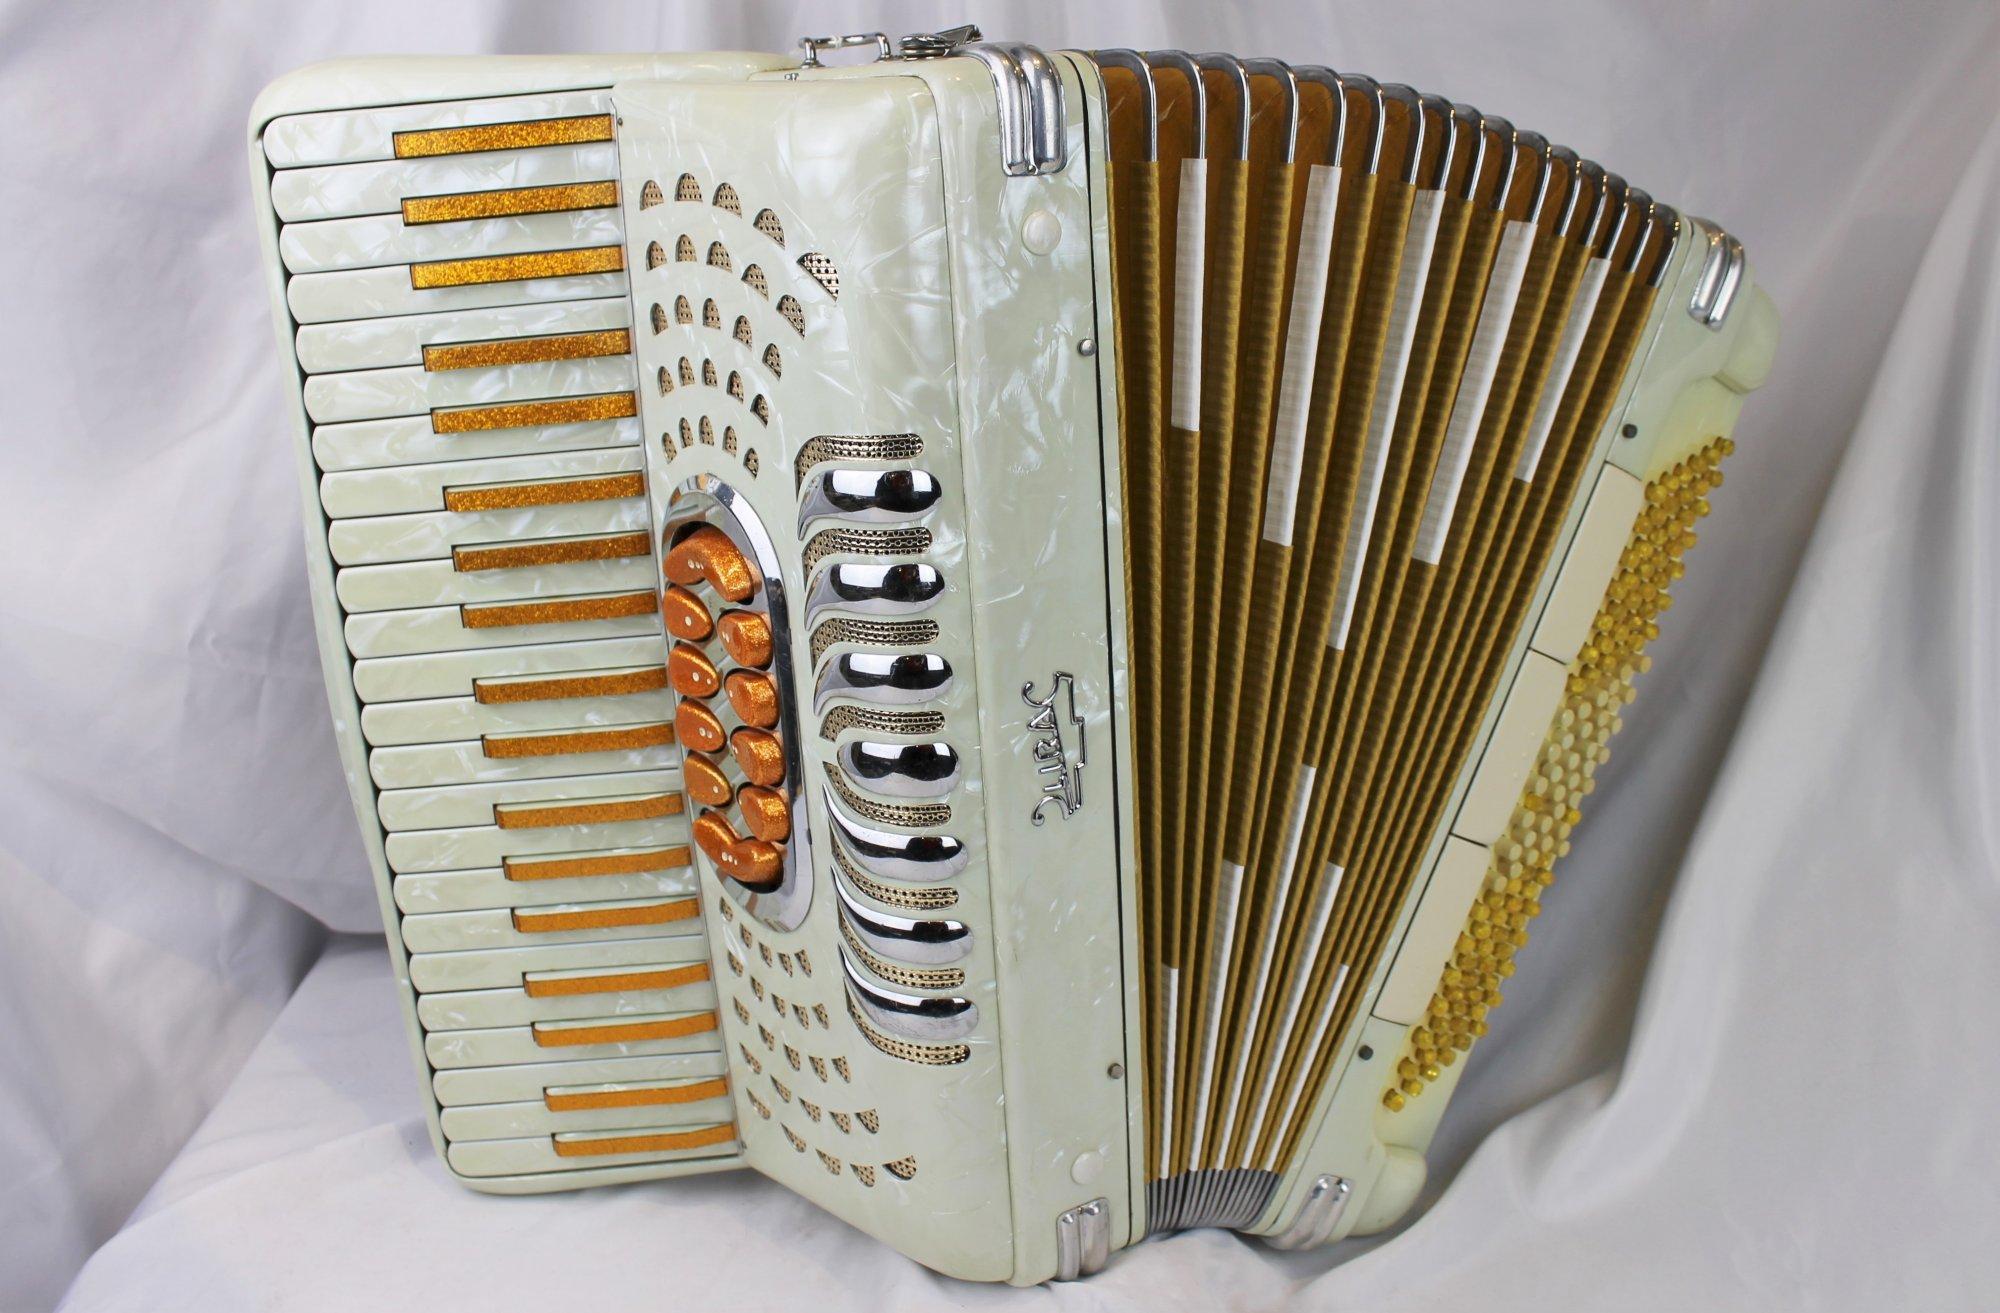 5198 - Ivory Gold Lira Piano Accordion LMH 41 120